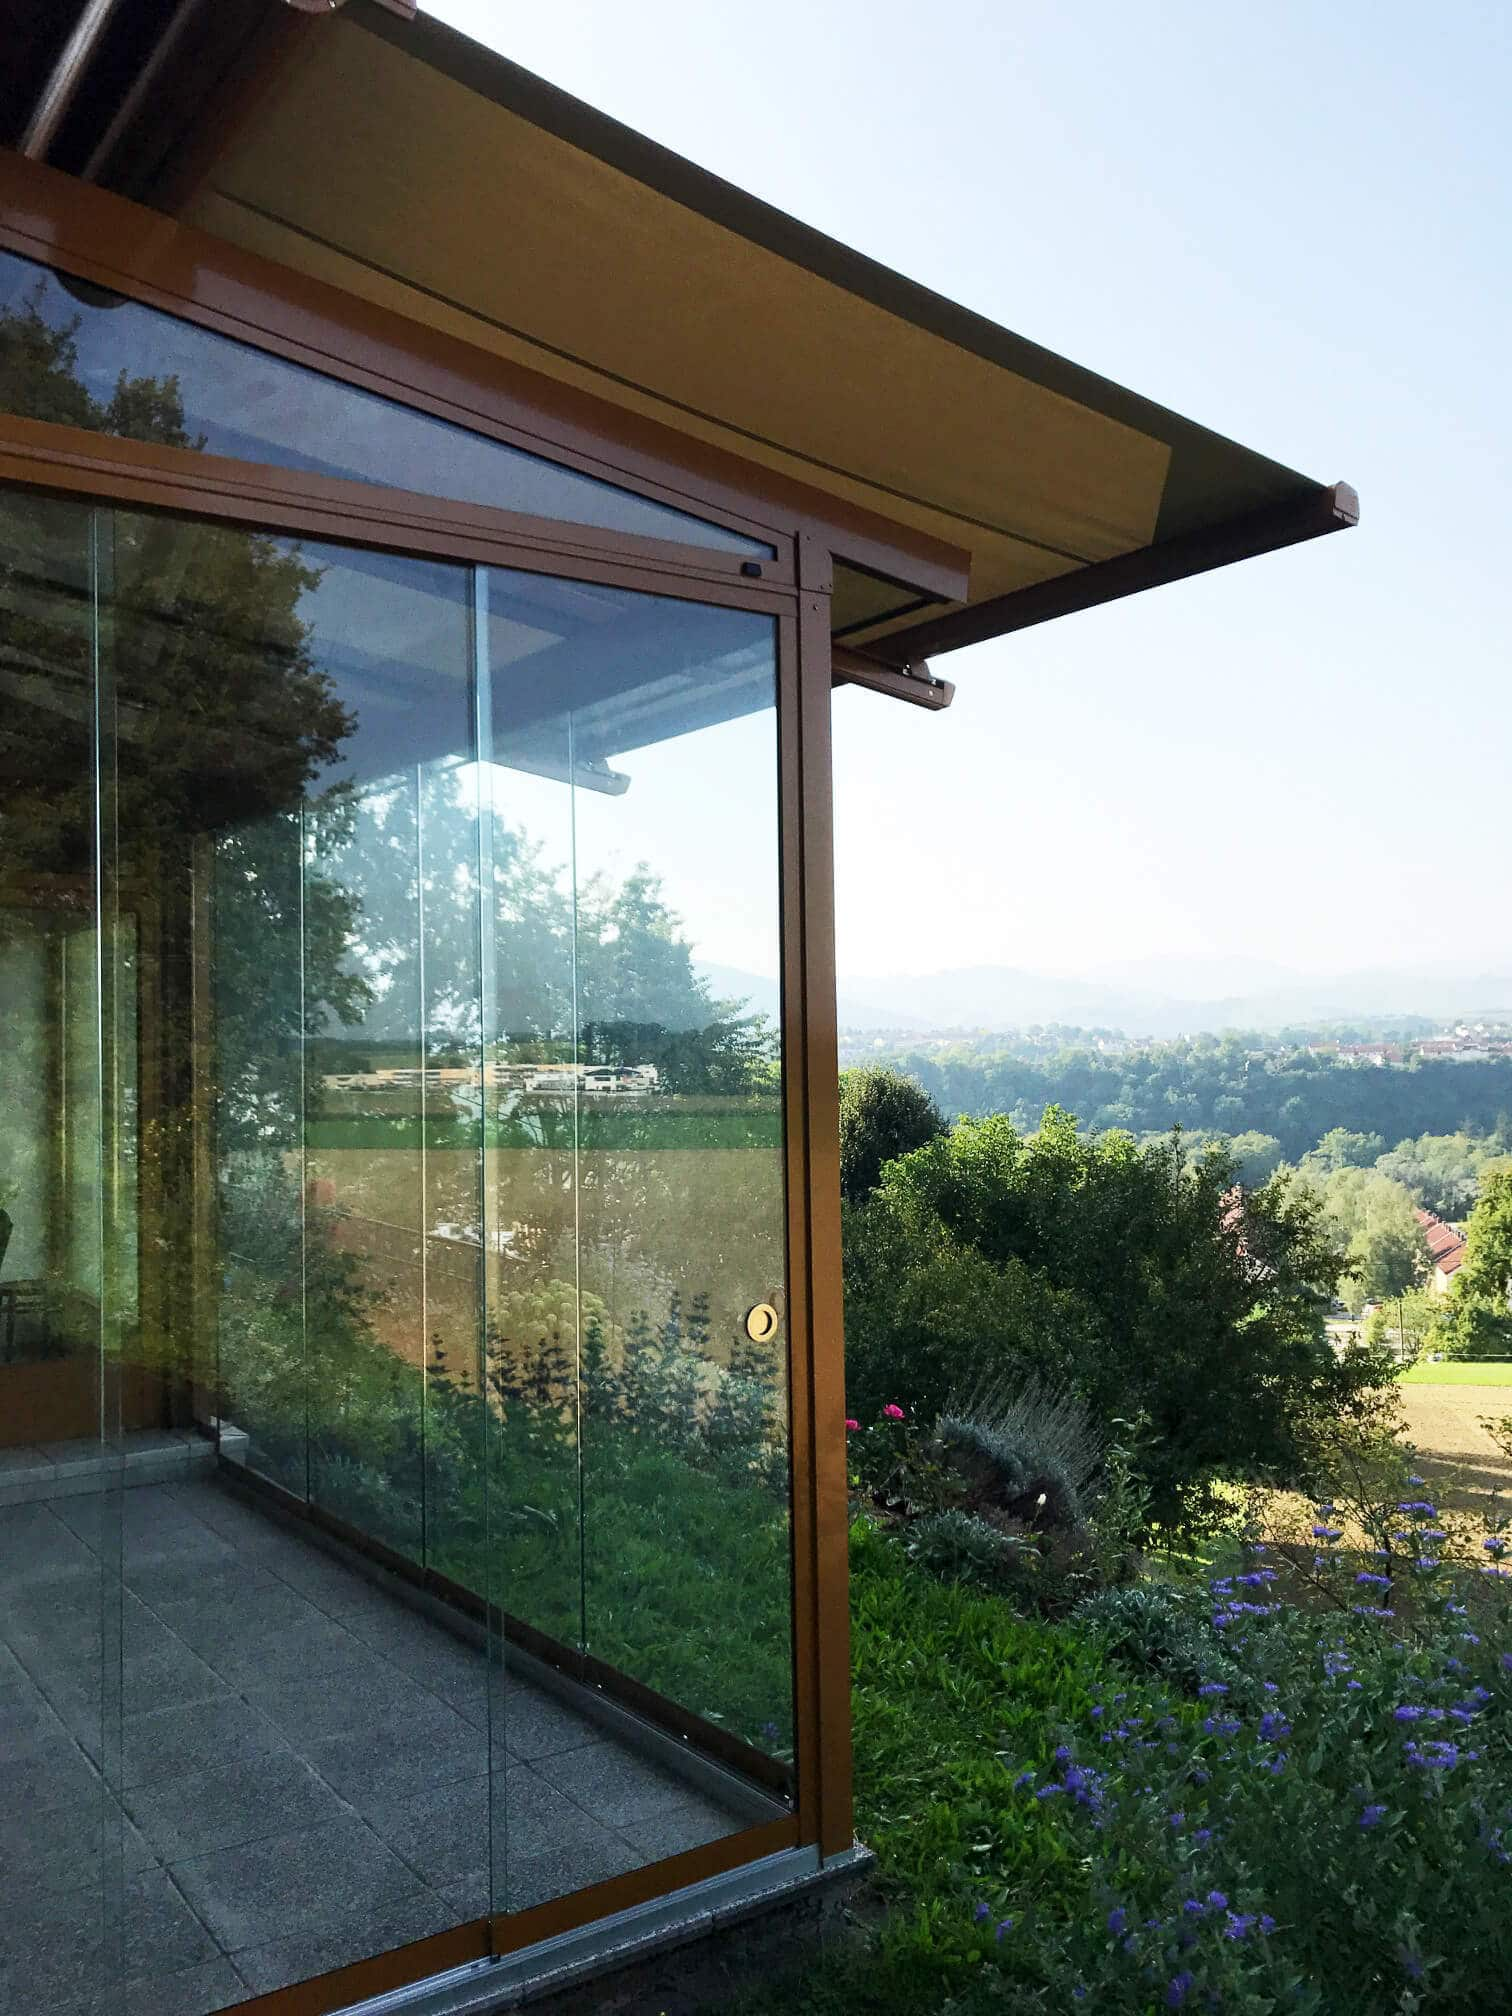 wintergarten anbau terrassen berdachung wintergarten. Black Bedroom Furniture Sets. Home Design Ideas